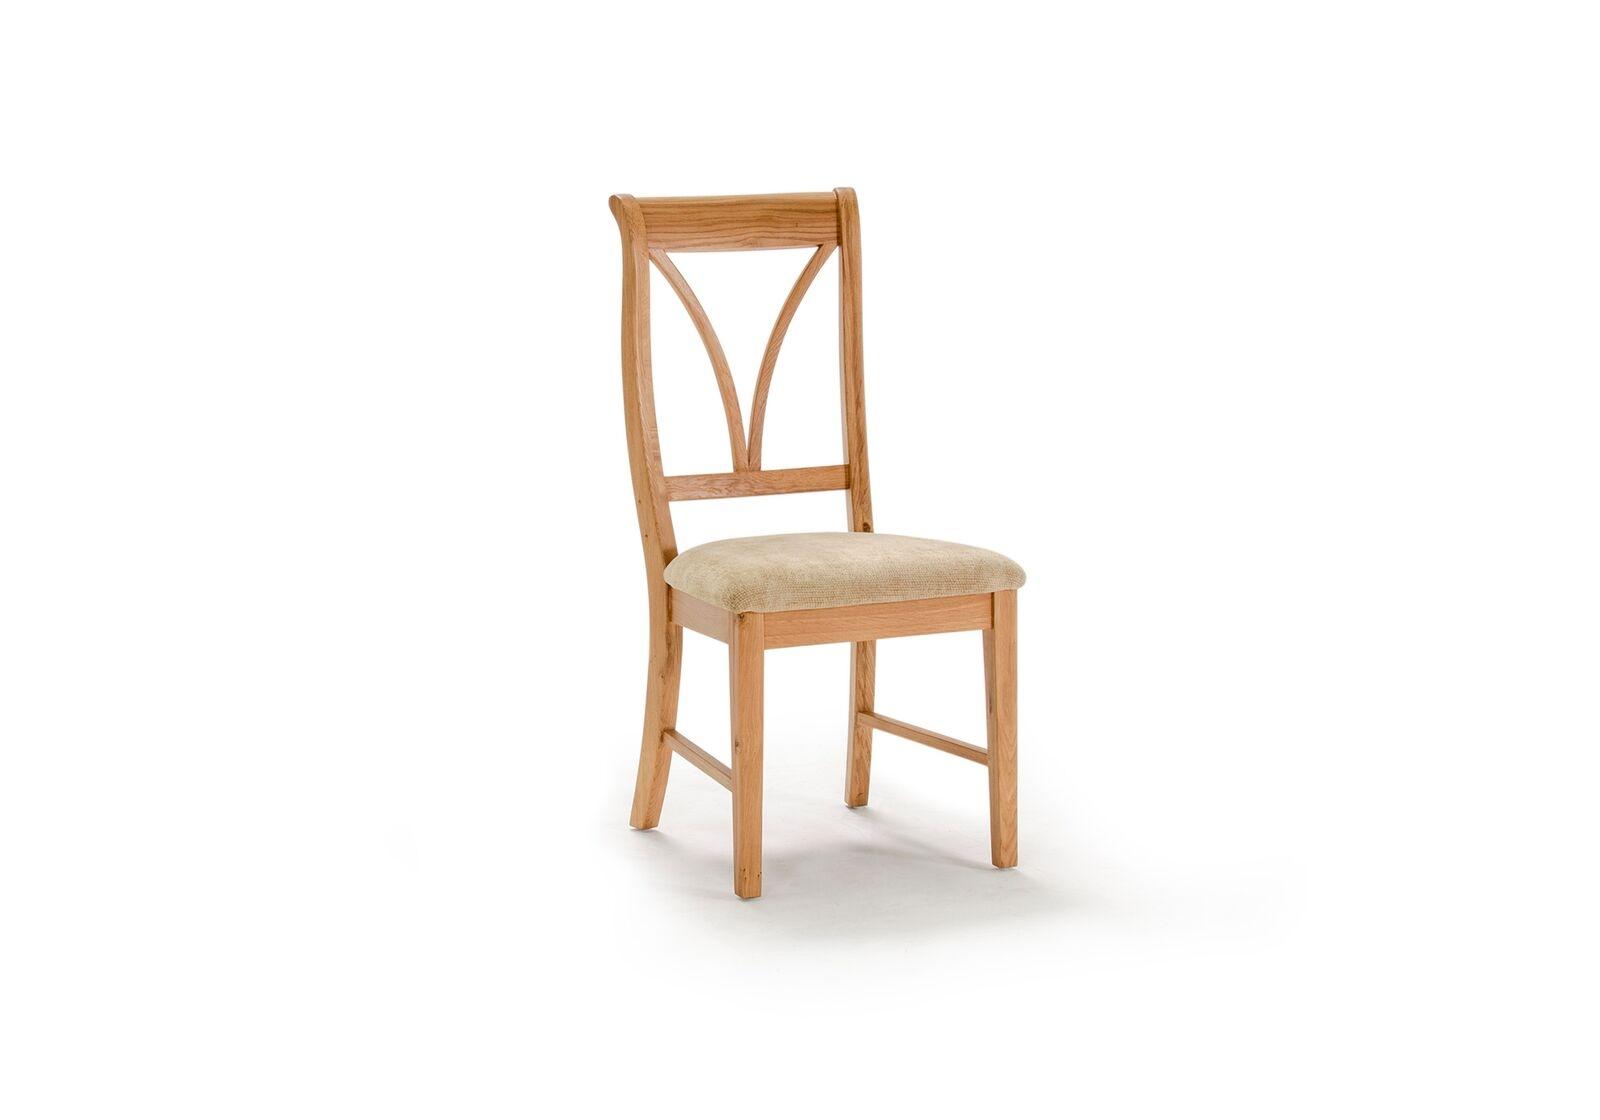 Scaun din lemn de stejar si furnir cu sezut tapitat cu stofa Carmen Oak l468xA537xH987 cm